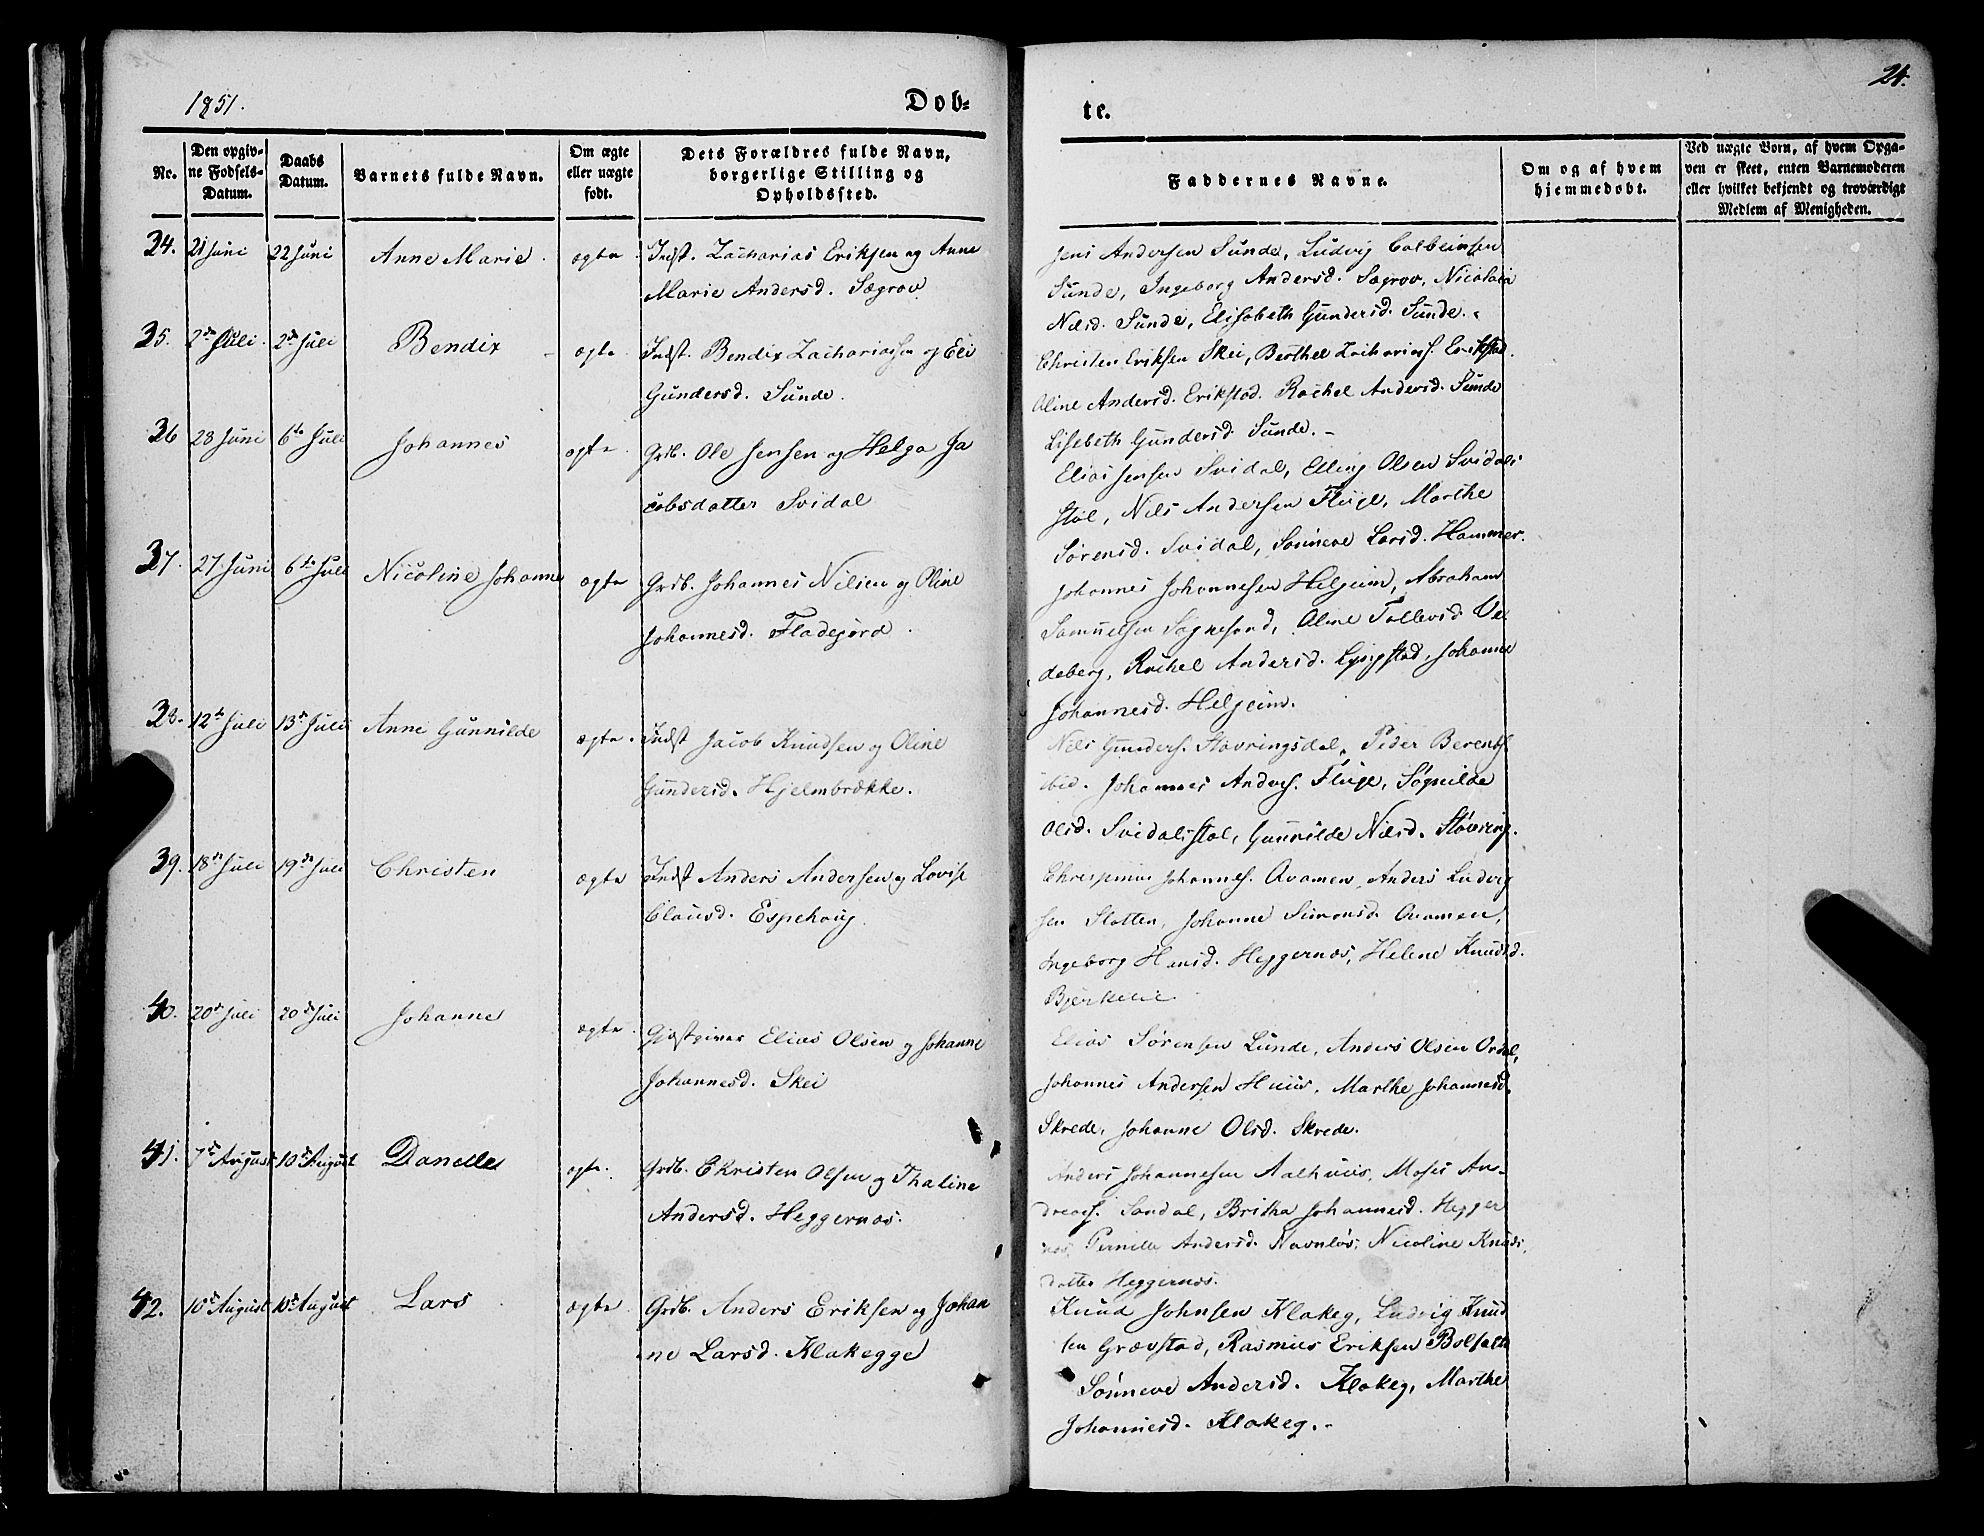 SAB, Jølster sokneprestembete, H/Haa/Haaa/L0010: Parish register (official) no. A 10, 1847-1865, p. 24